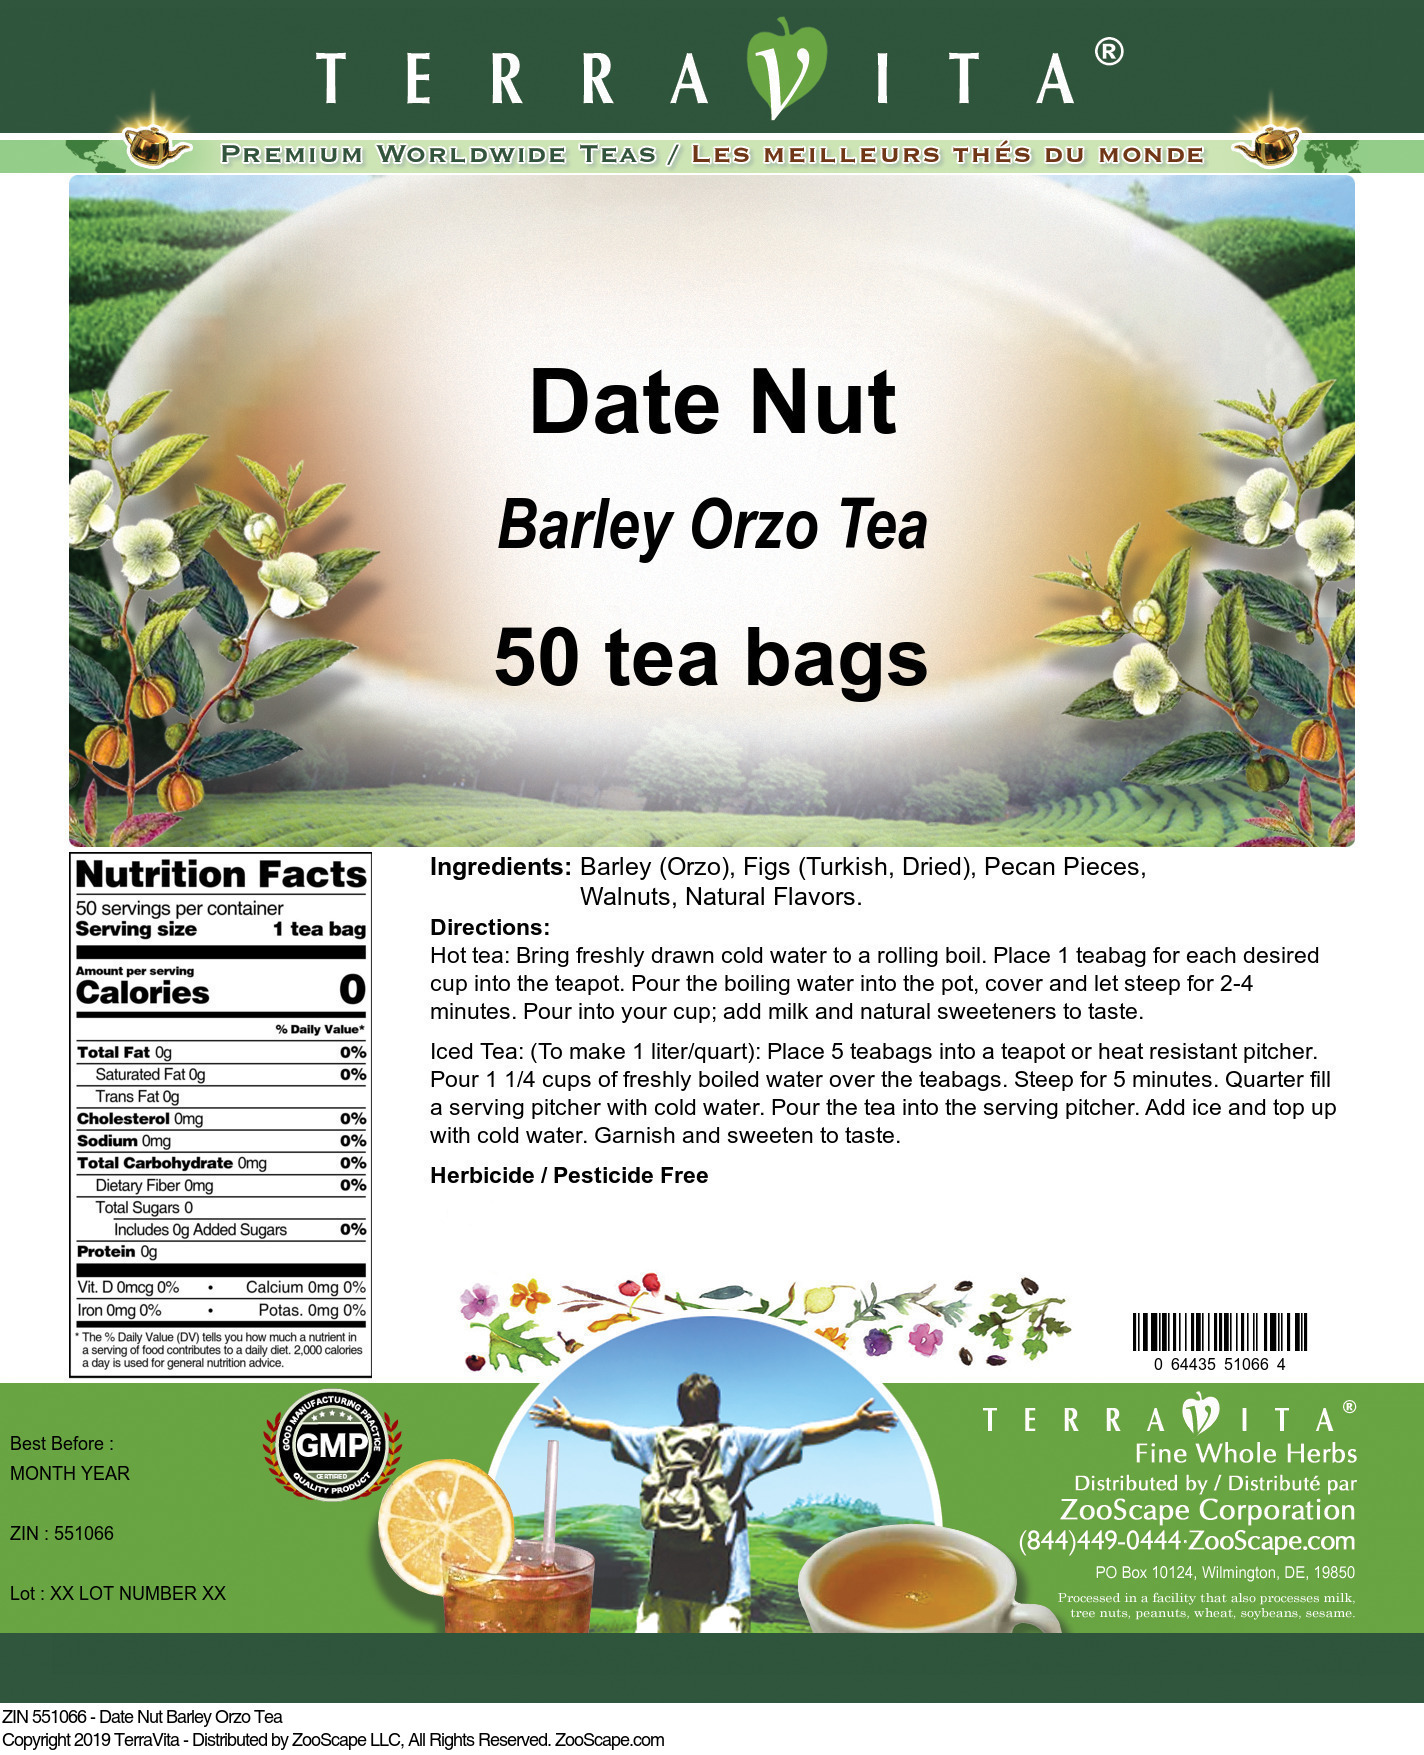 Date Nut Barley Orzo Tea